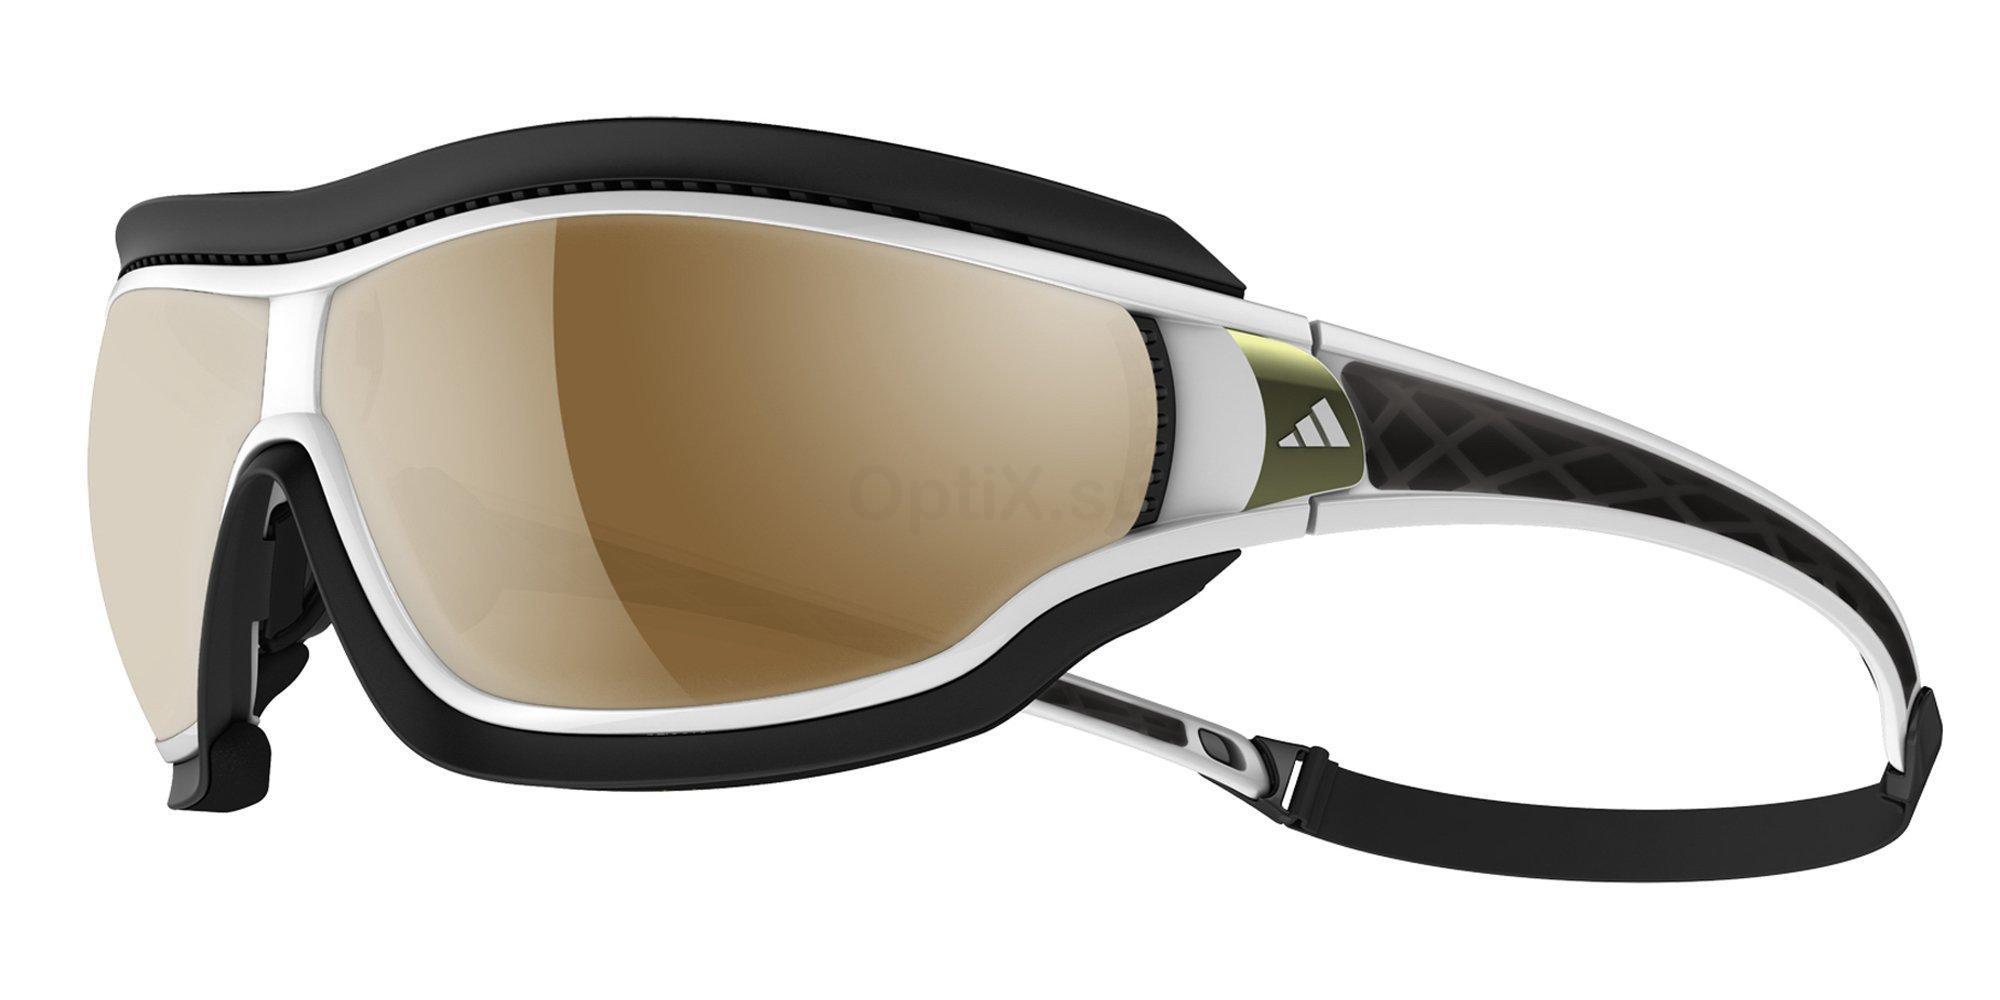 a196 00 6052 a196 Tycane Pro Outdoor L Sunglasses, Adidas